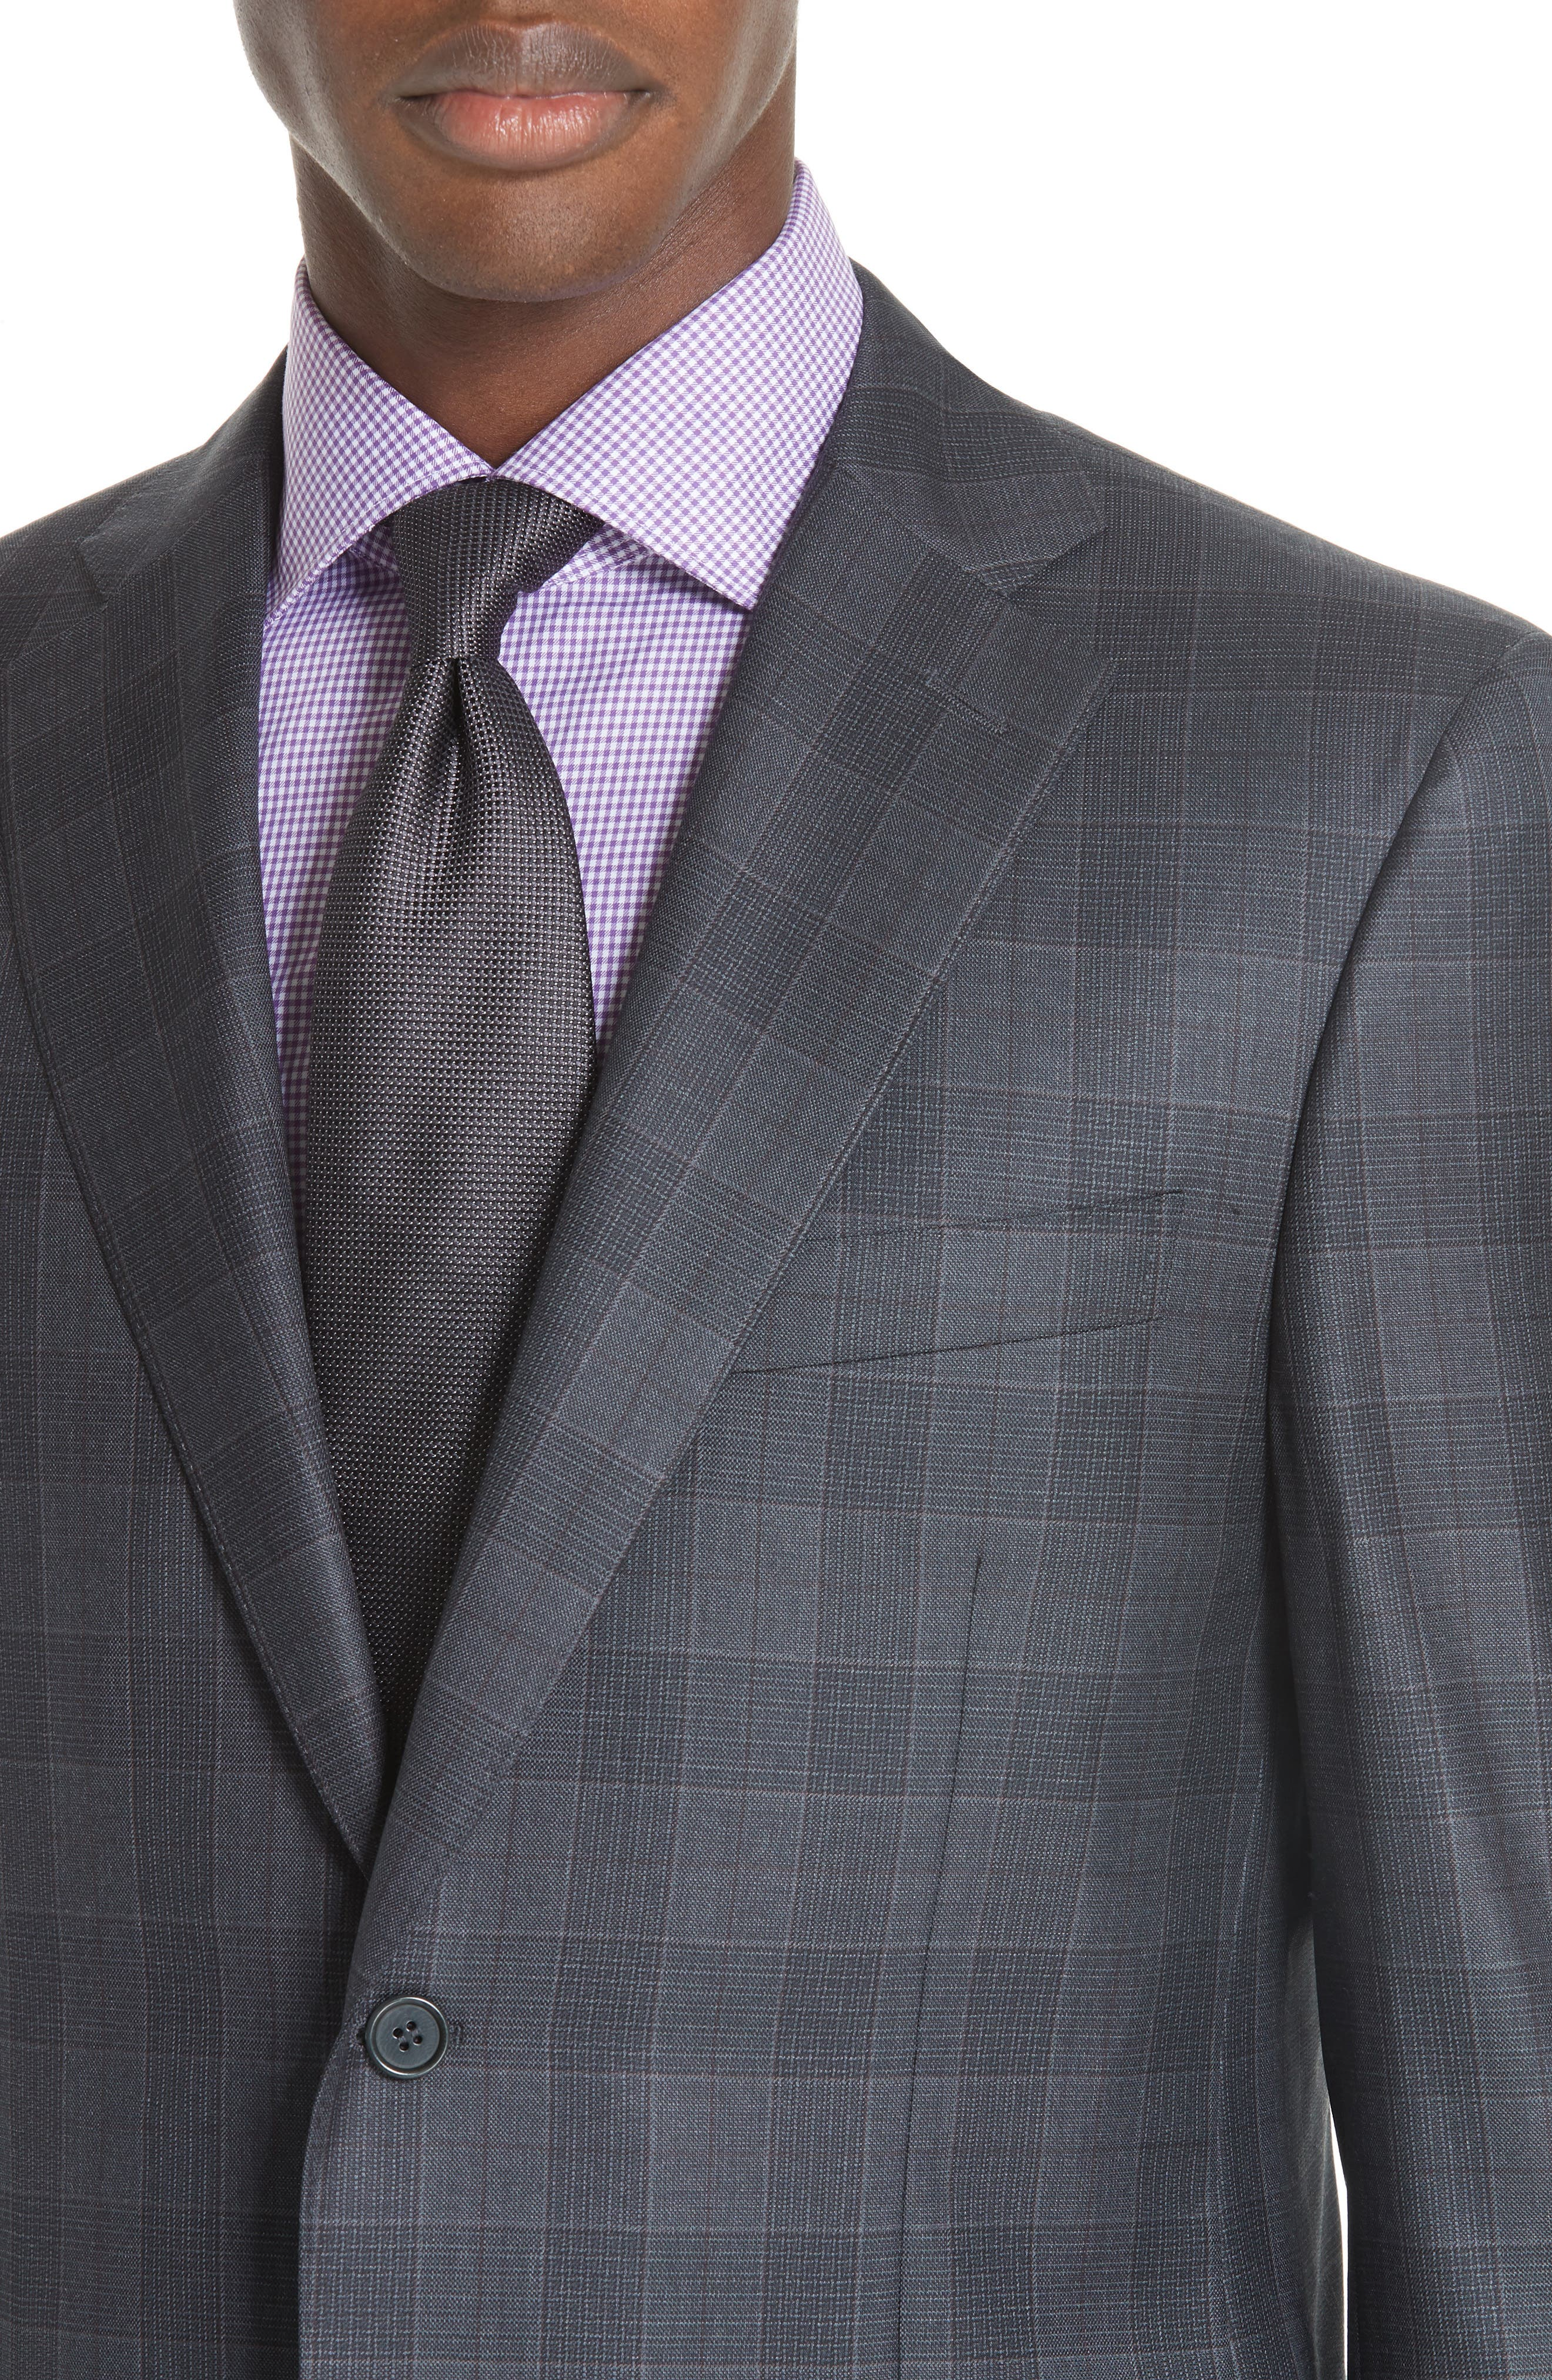 Classic Fit Plaid Wool Suit,                             Alternate thumbnail 4, color,                             CHARCOAL